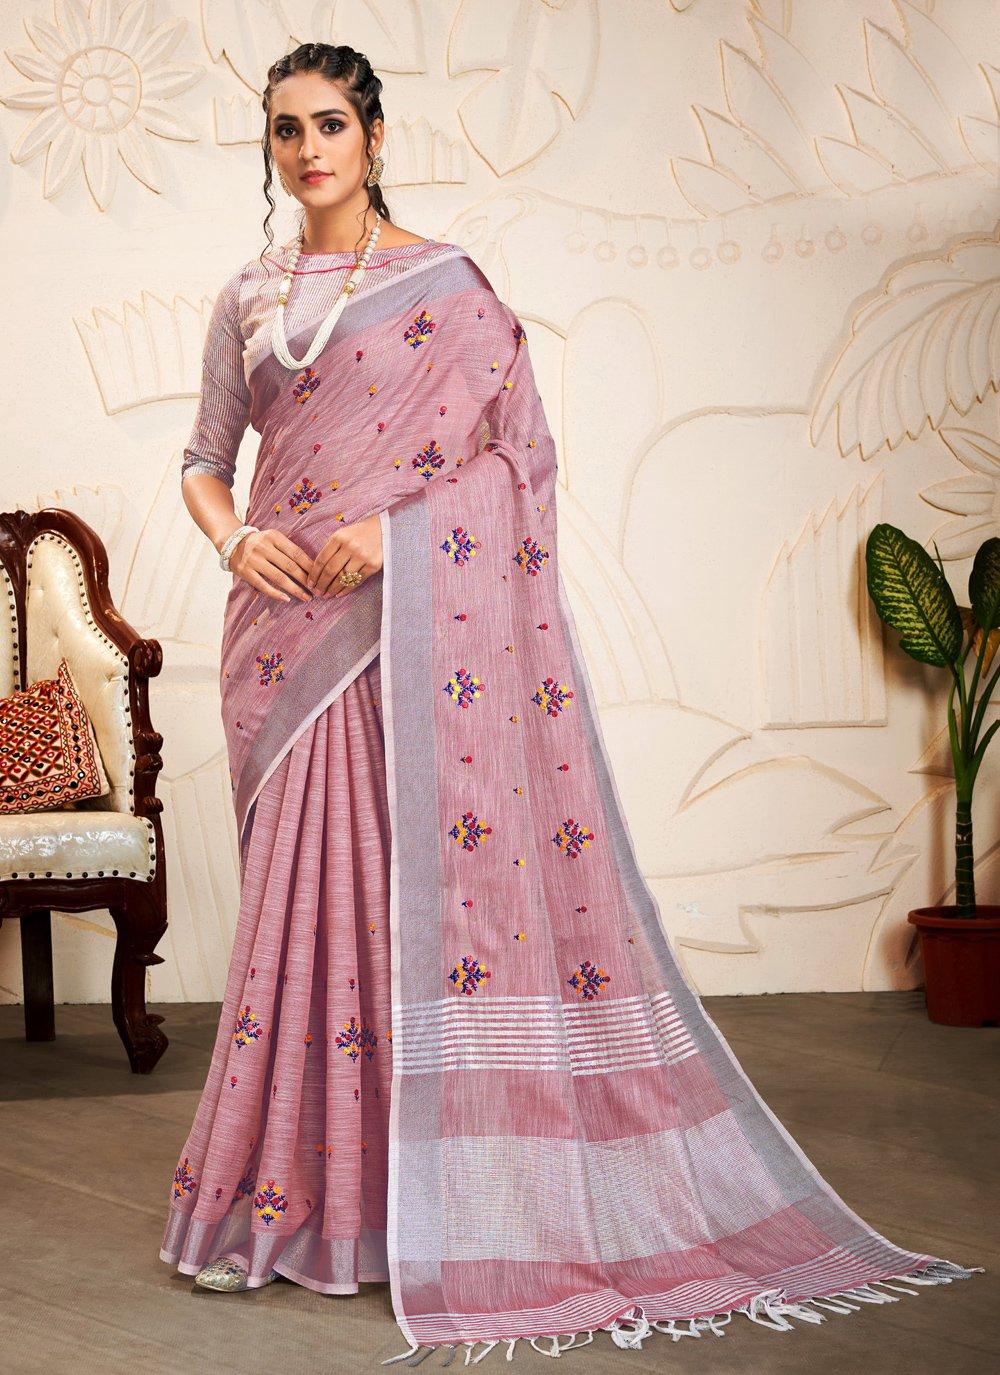 Linen Embroidered Magenta Classic Saree